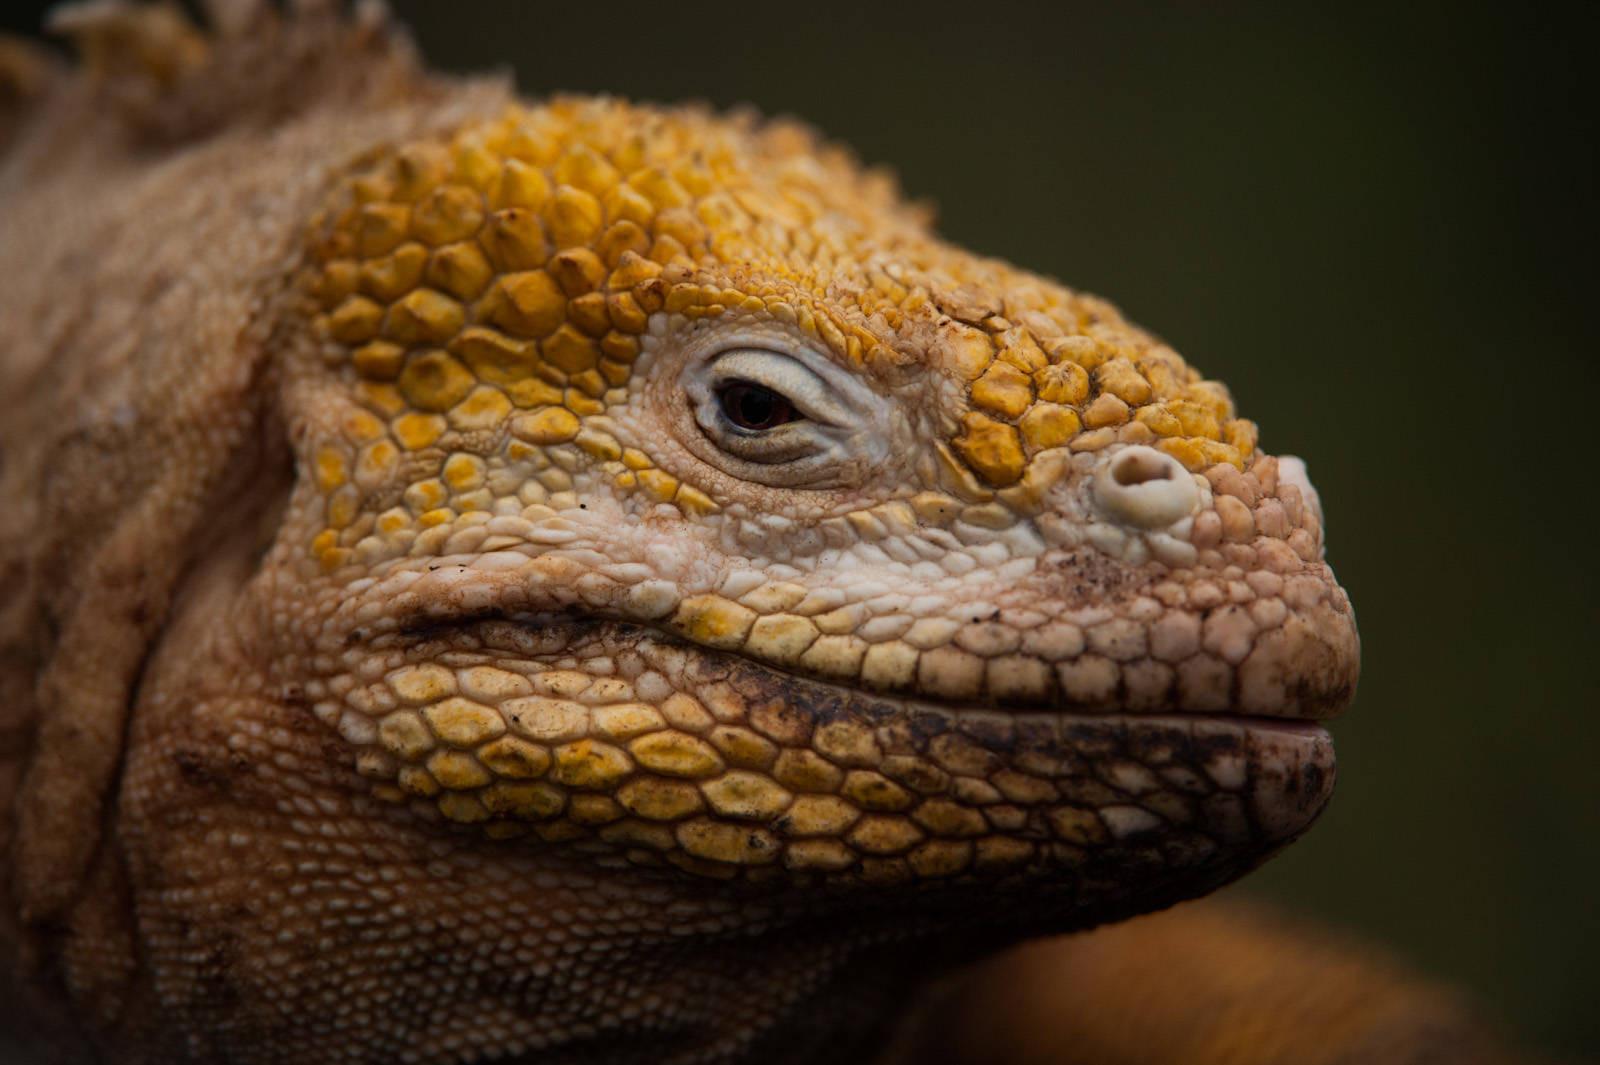 Photo: A Galapagos land iguana (Conolophus subcristatus) on Urbina Bay, Isabela Island in Galapagos National Park.